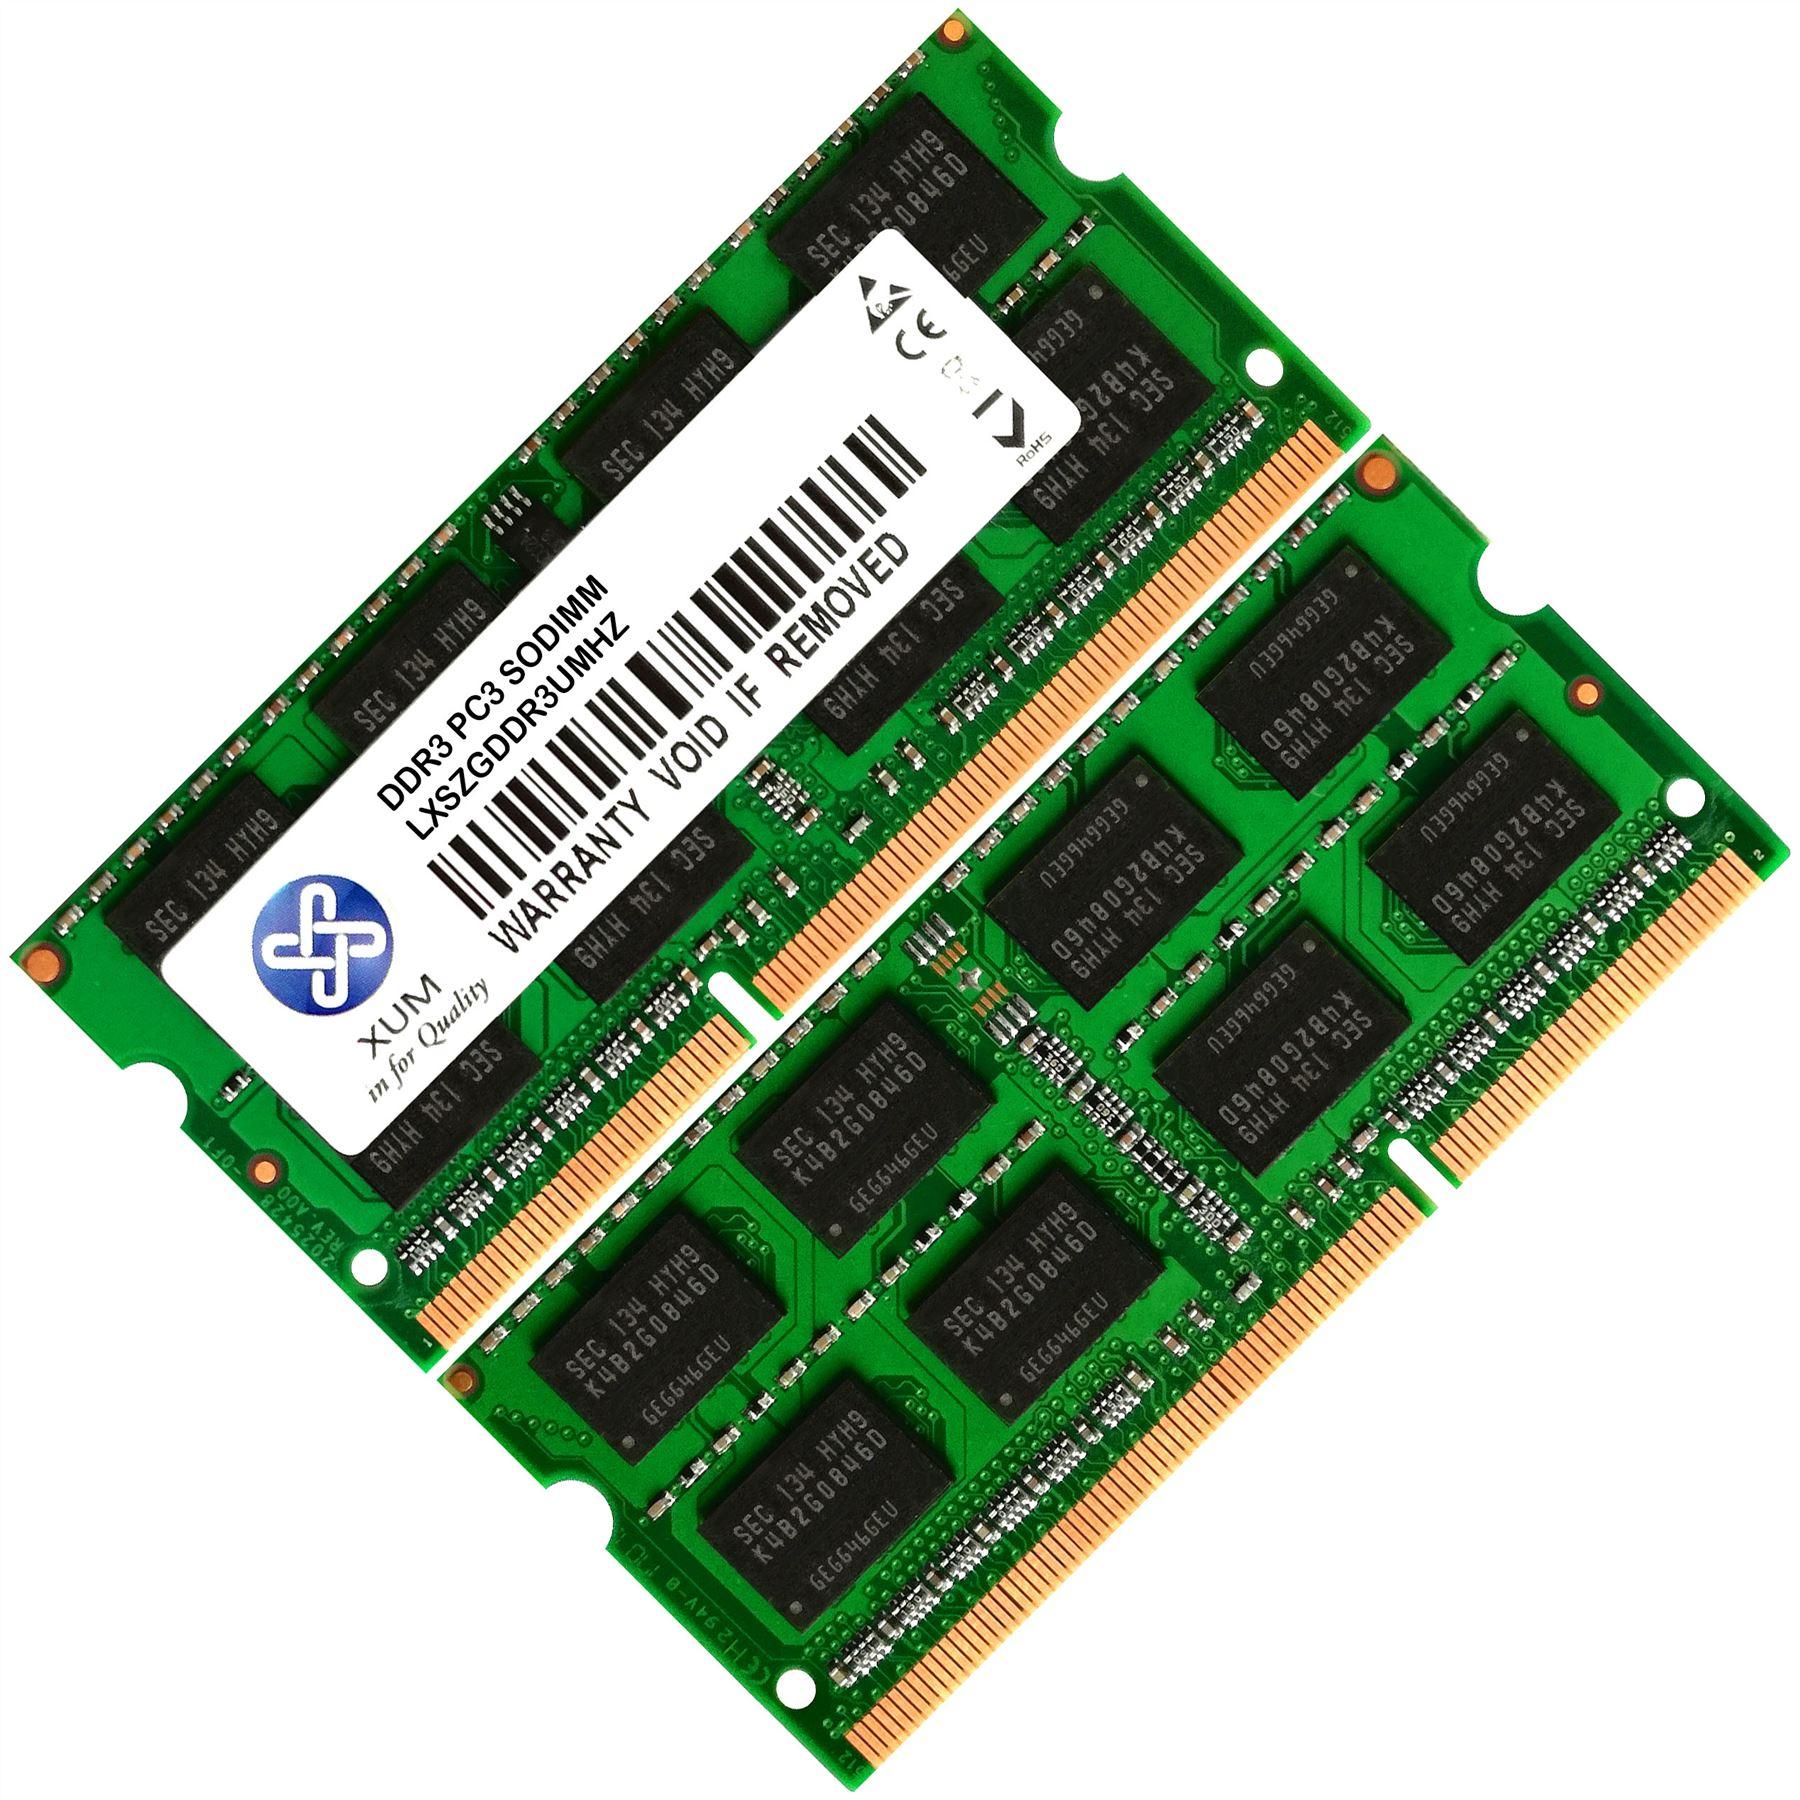 Memoria-Ram-Toshiba-Satellite-Laptop-C55-A-109-C55-A-10D-Nuevo-Lot-DDR3-SDRAM